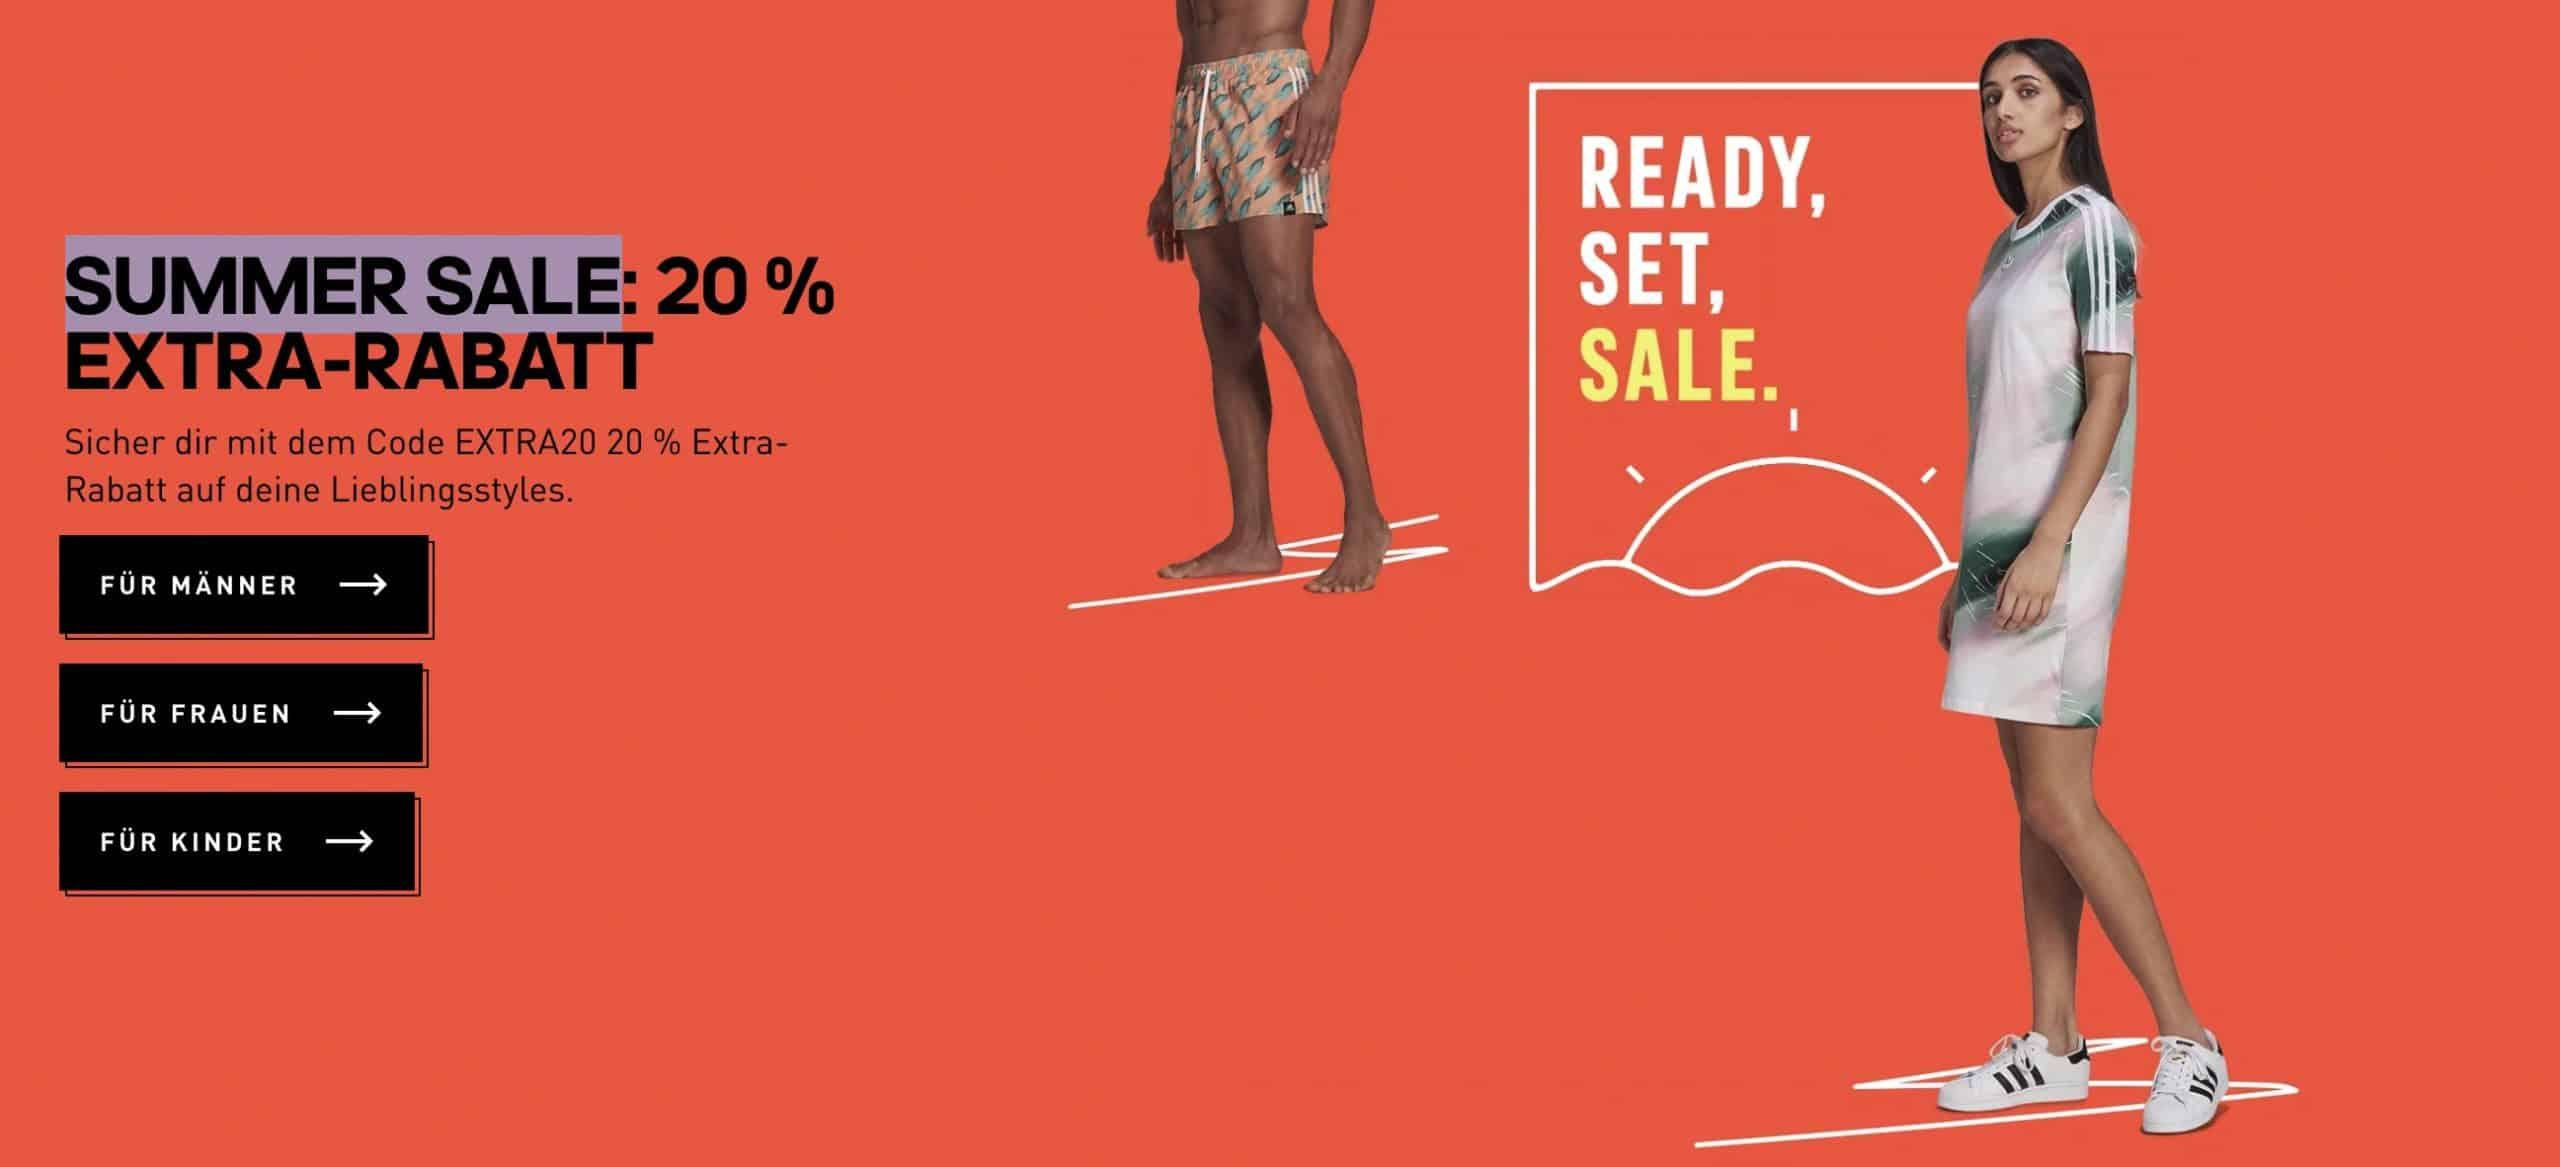 Adidas Summer Sale scaled